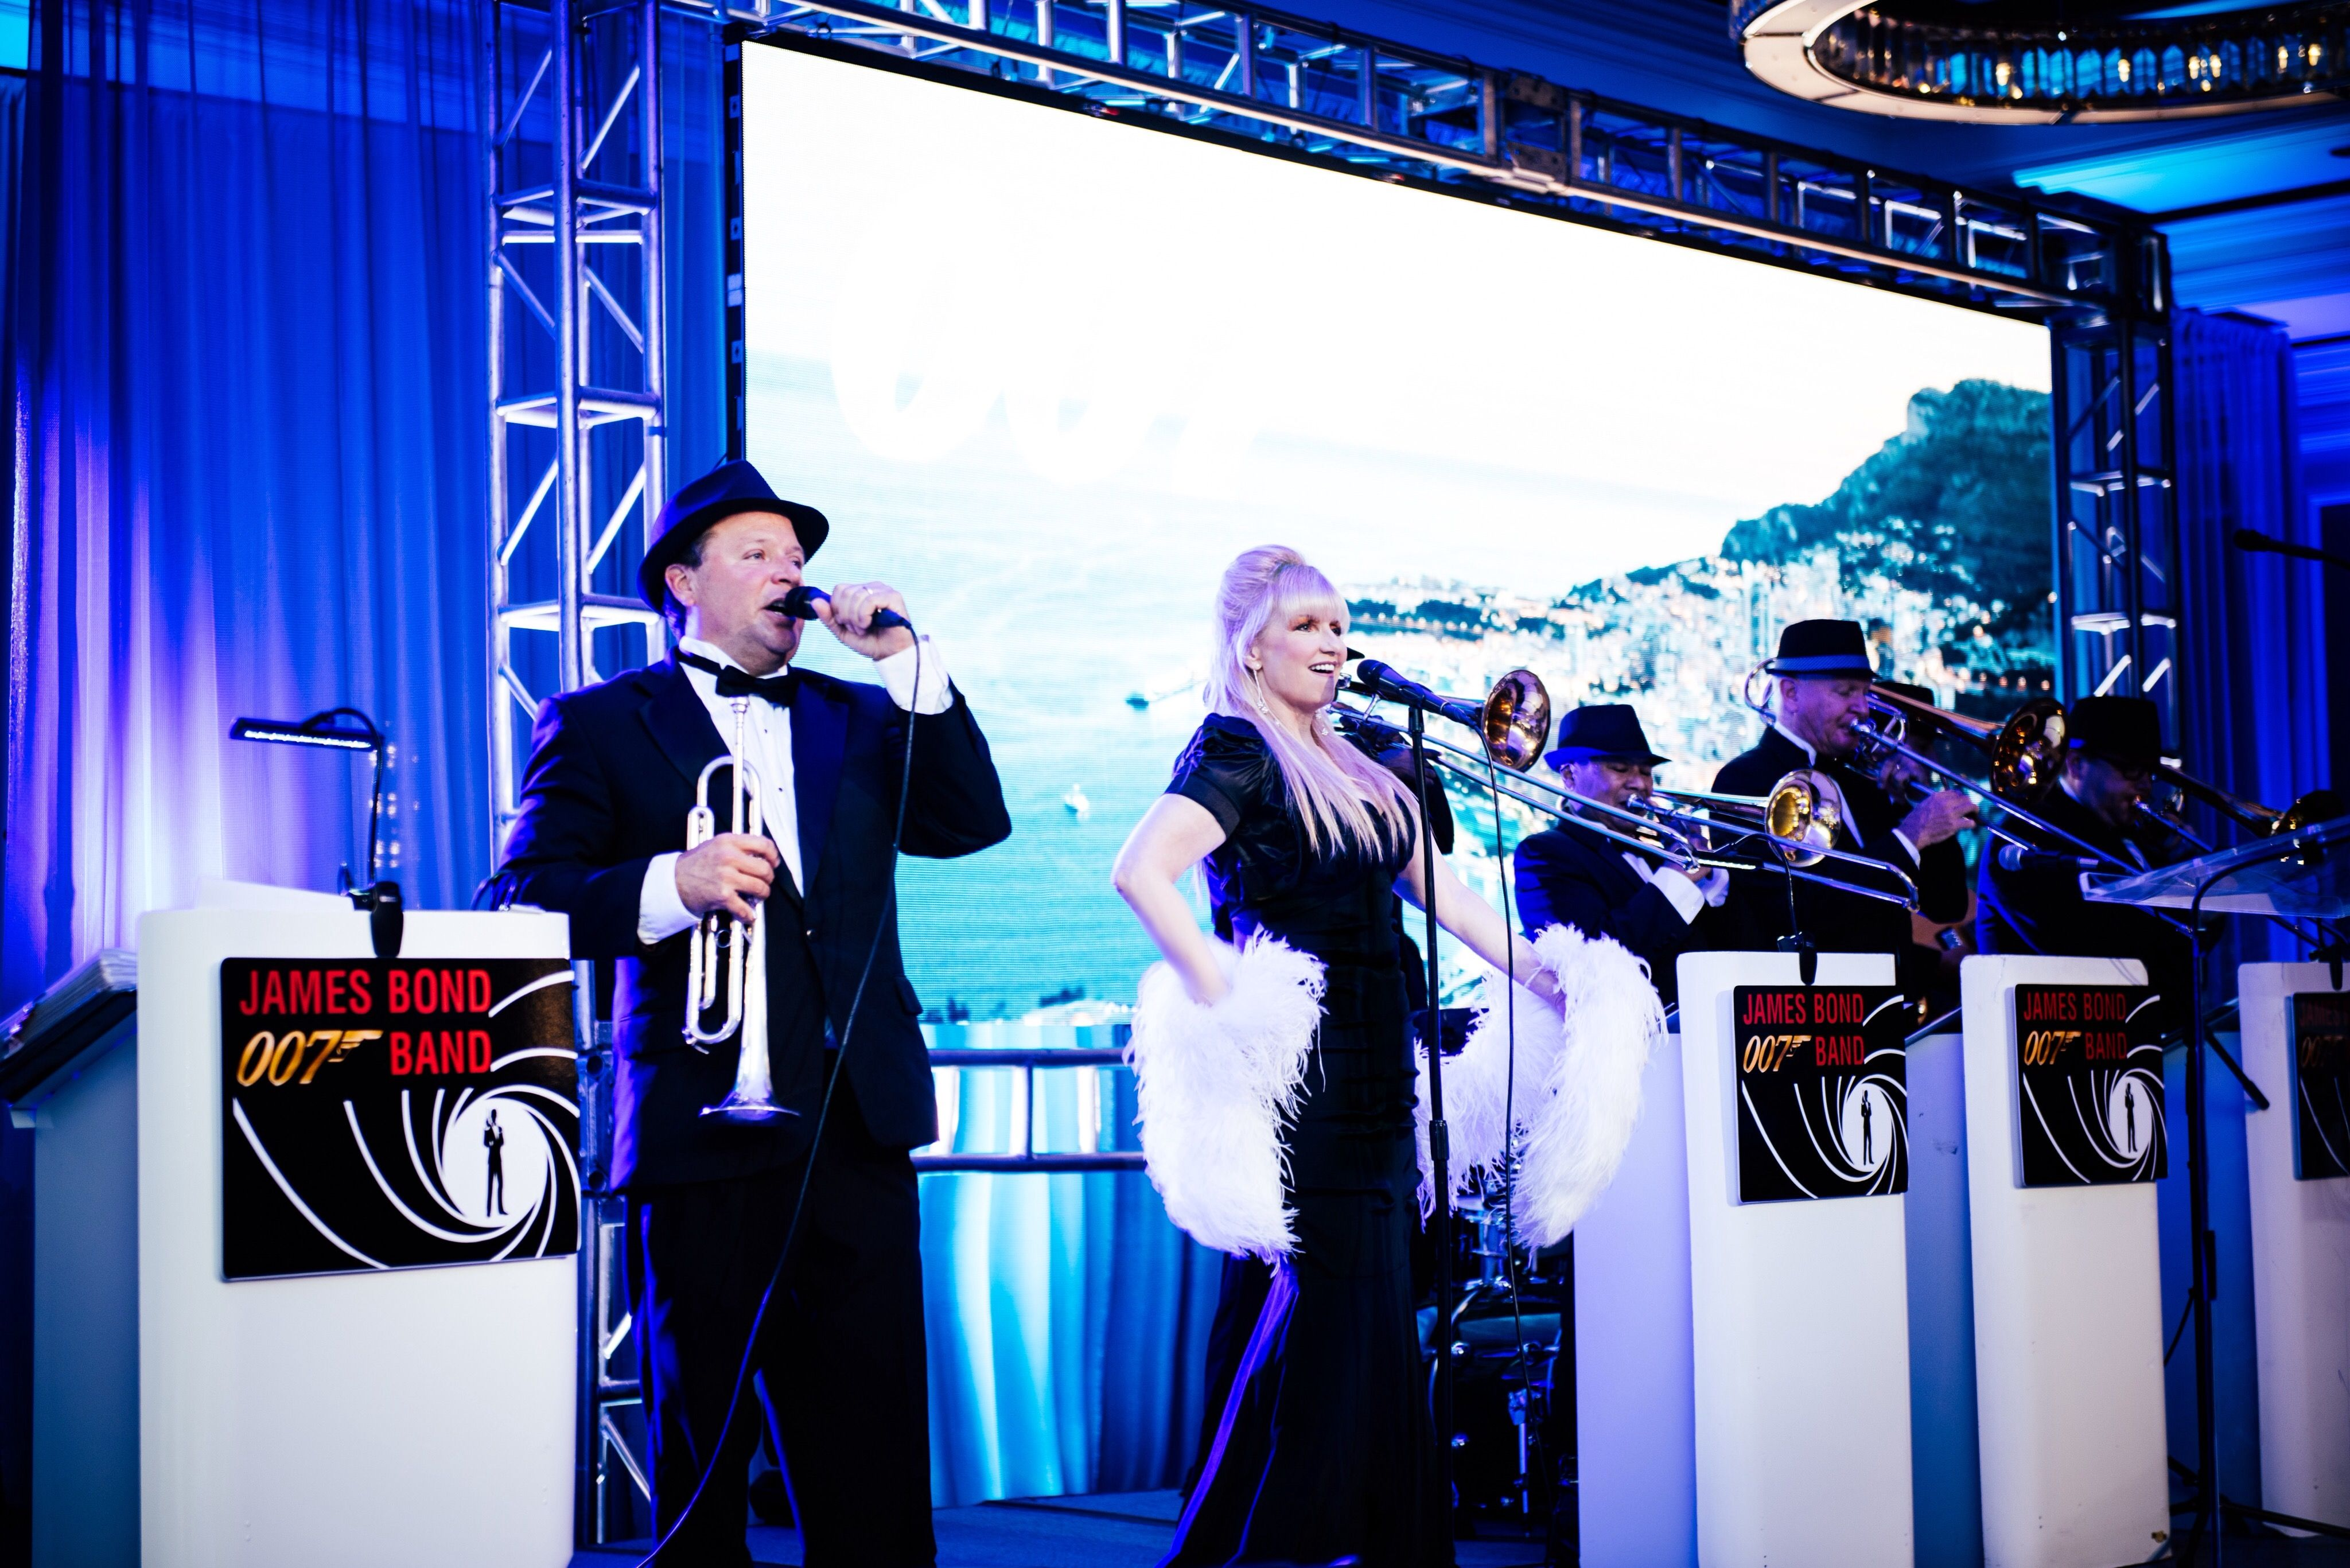 James bond 007 band performs iconic bond themes and james